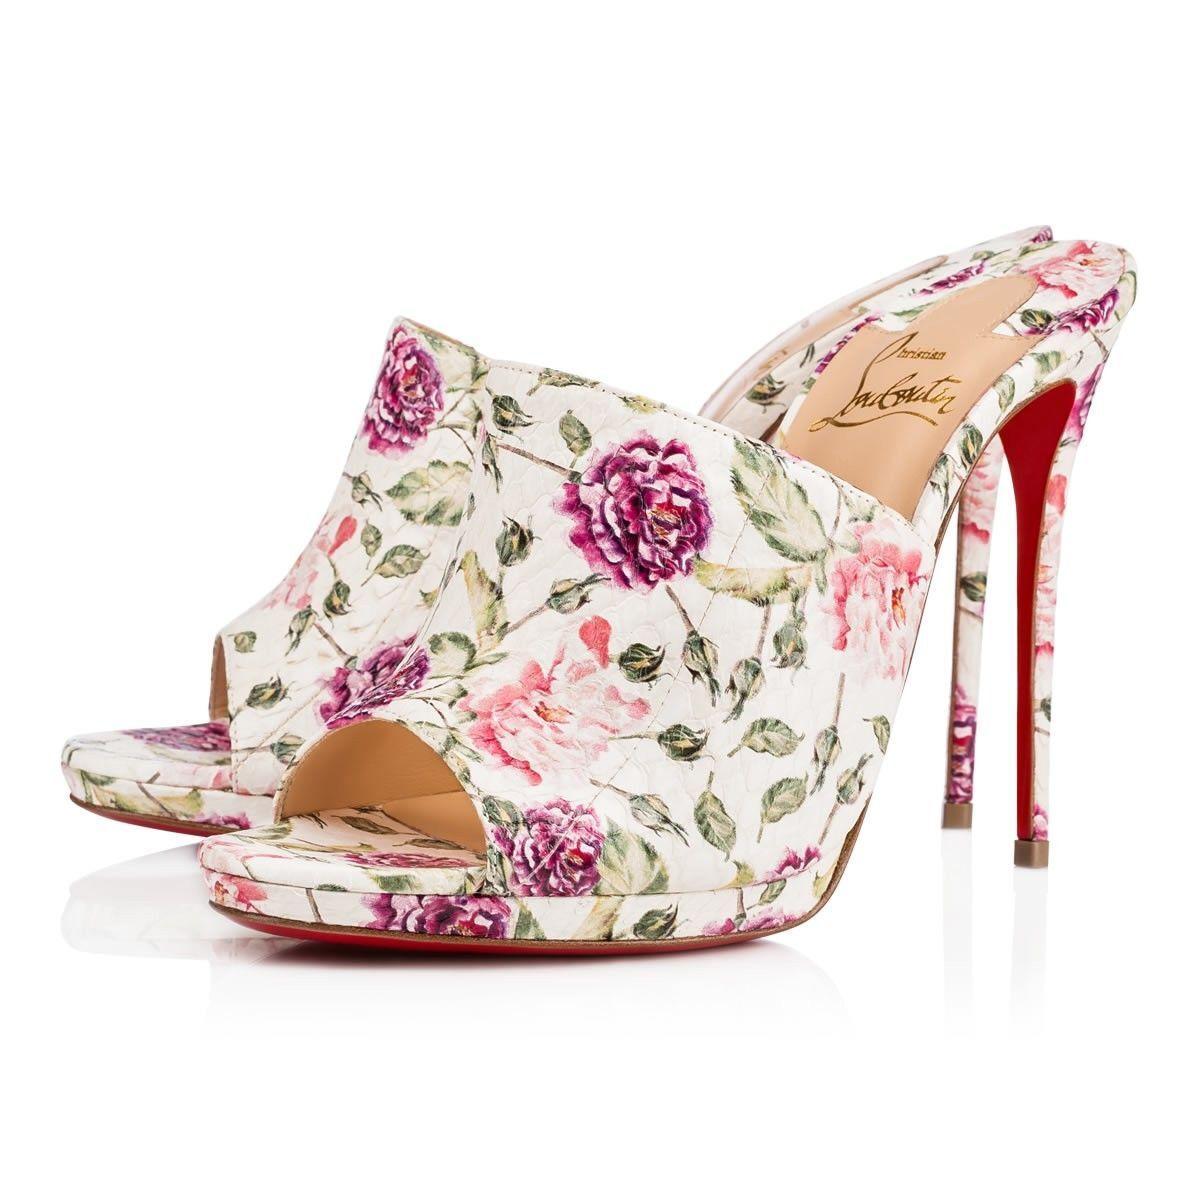 NIB Christian Louboutin Pigamule 120 White Pink Floral Mule Sandal Heel Pump 38